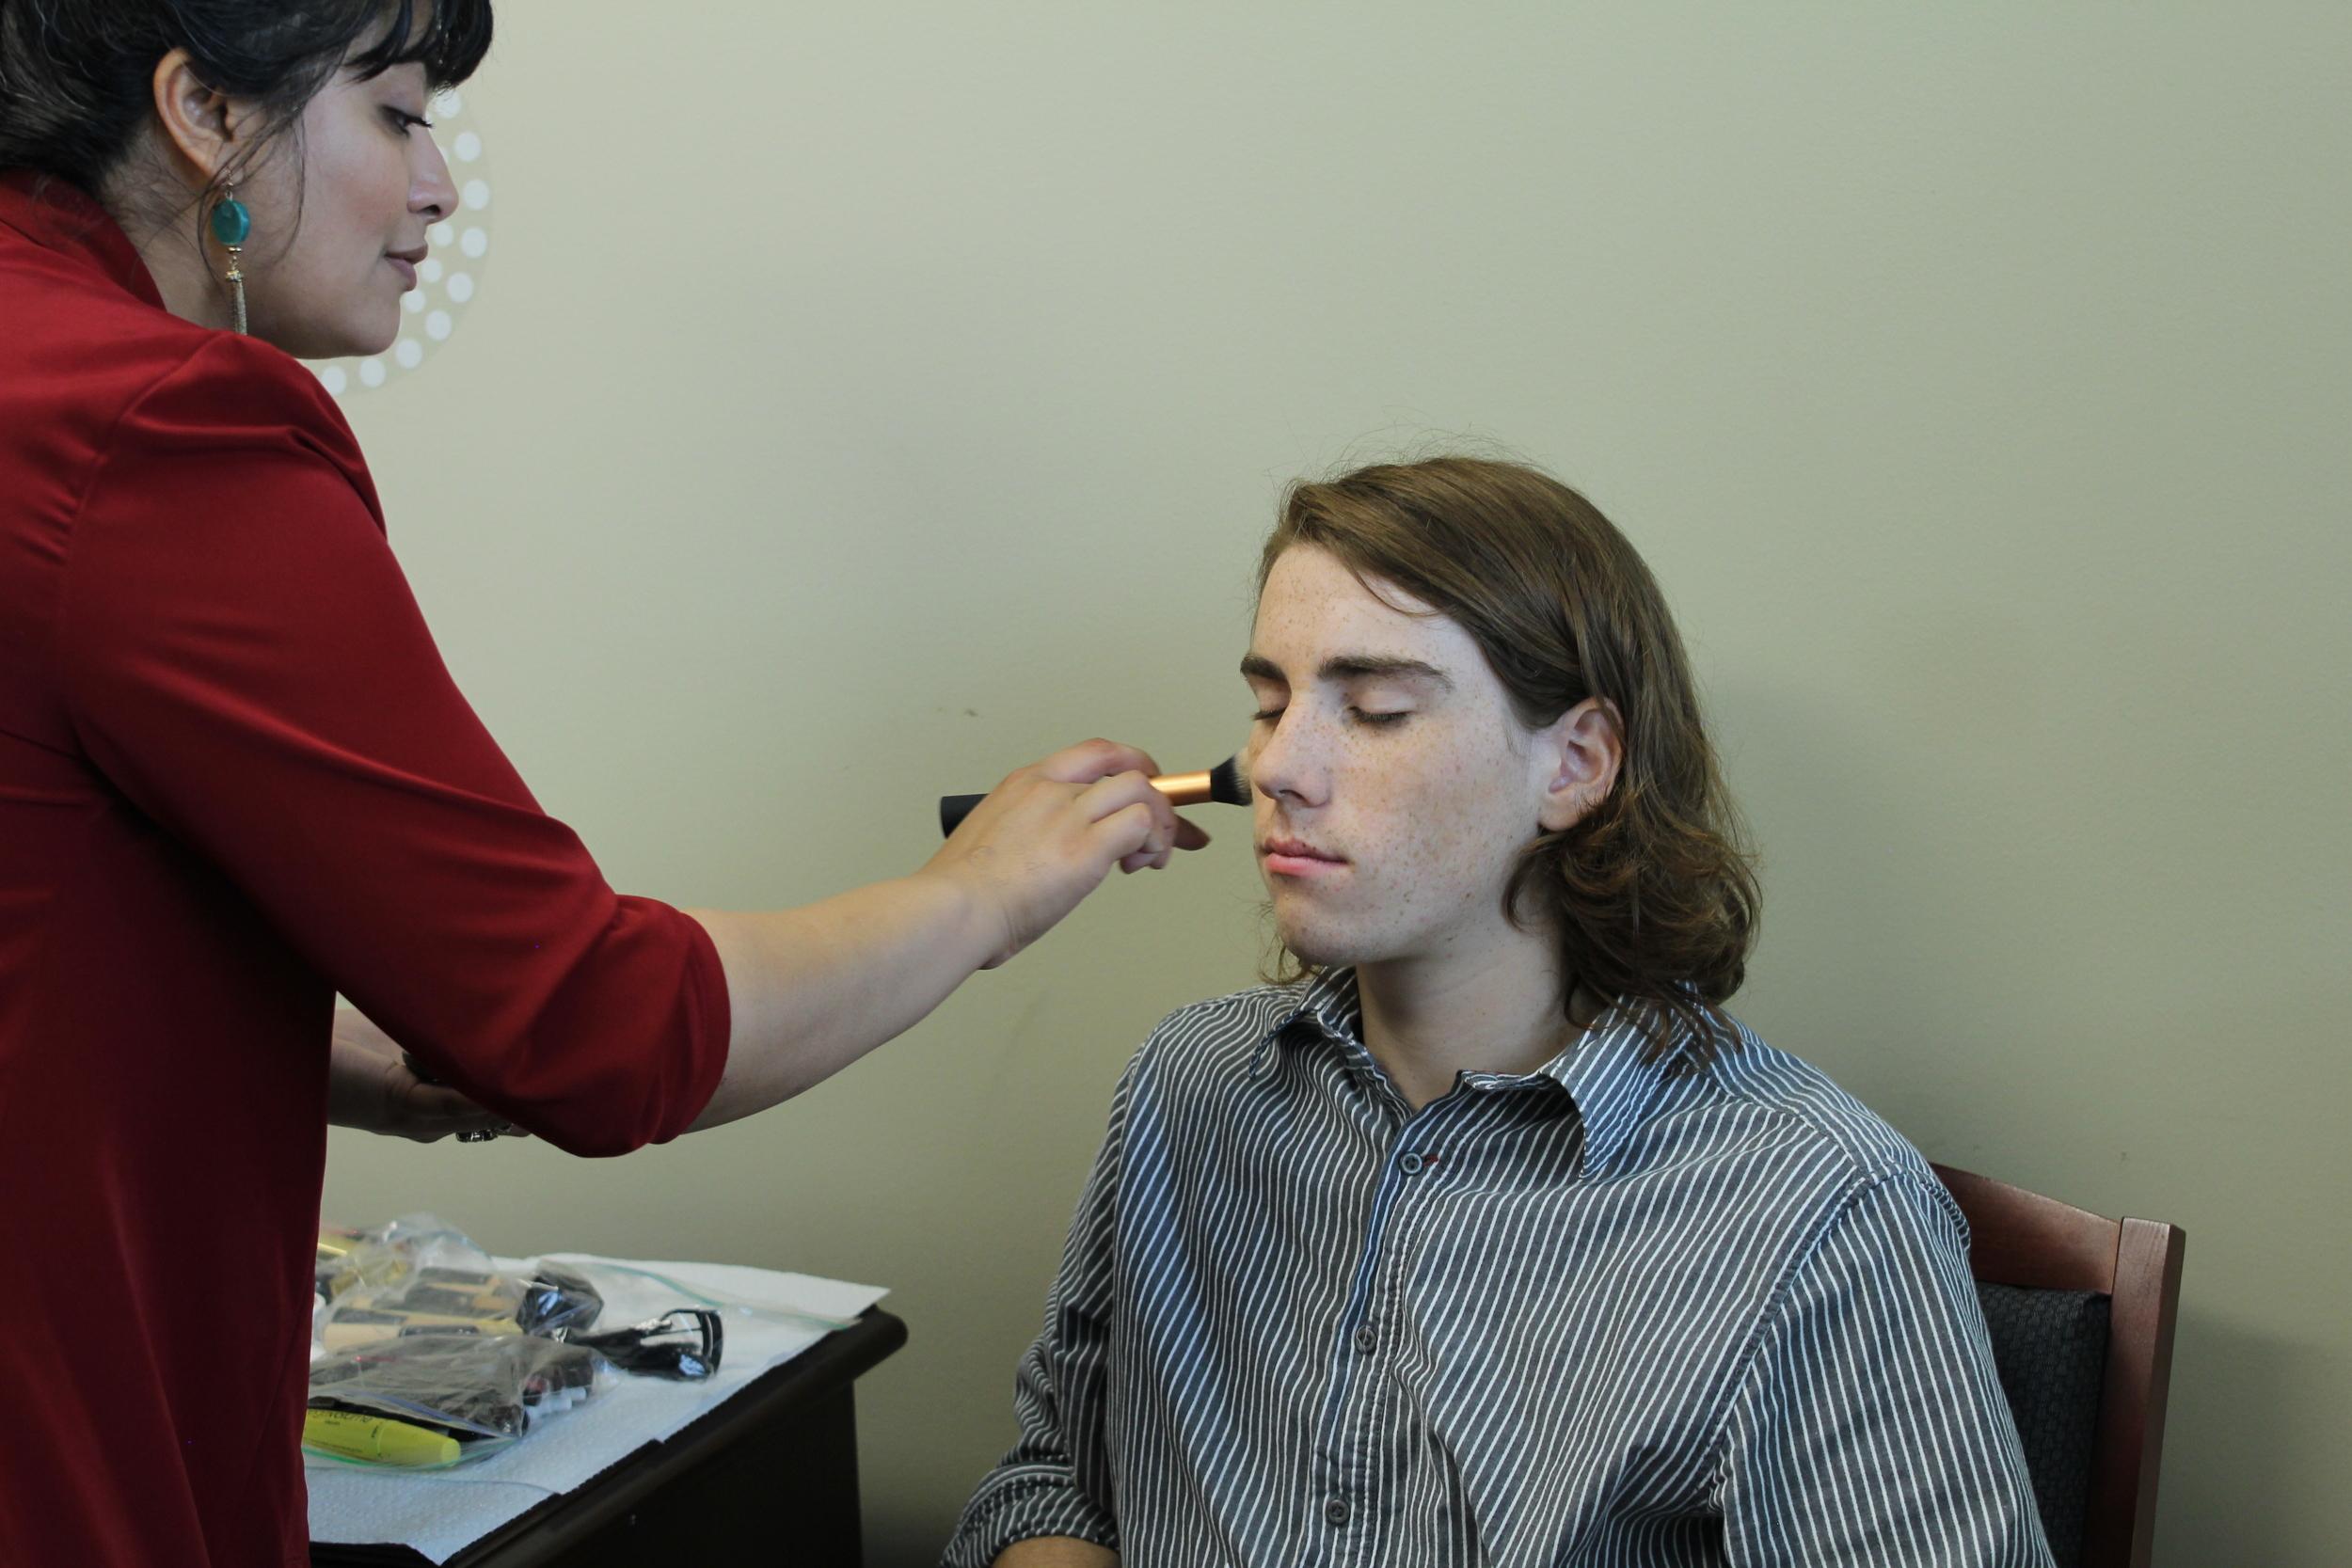 Shaheera Bhutto (Makeup) preps actor Harrison Farmer